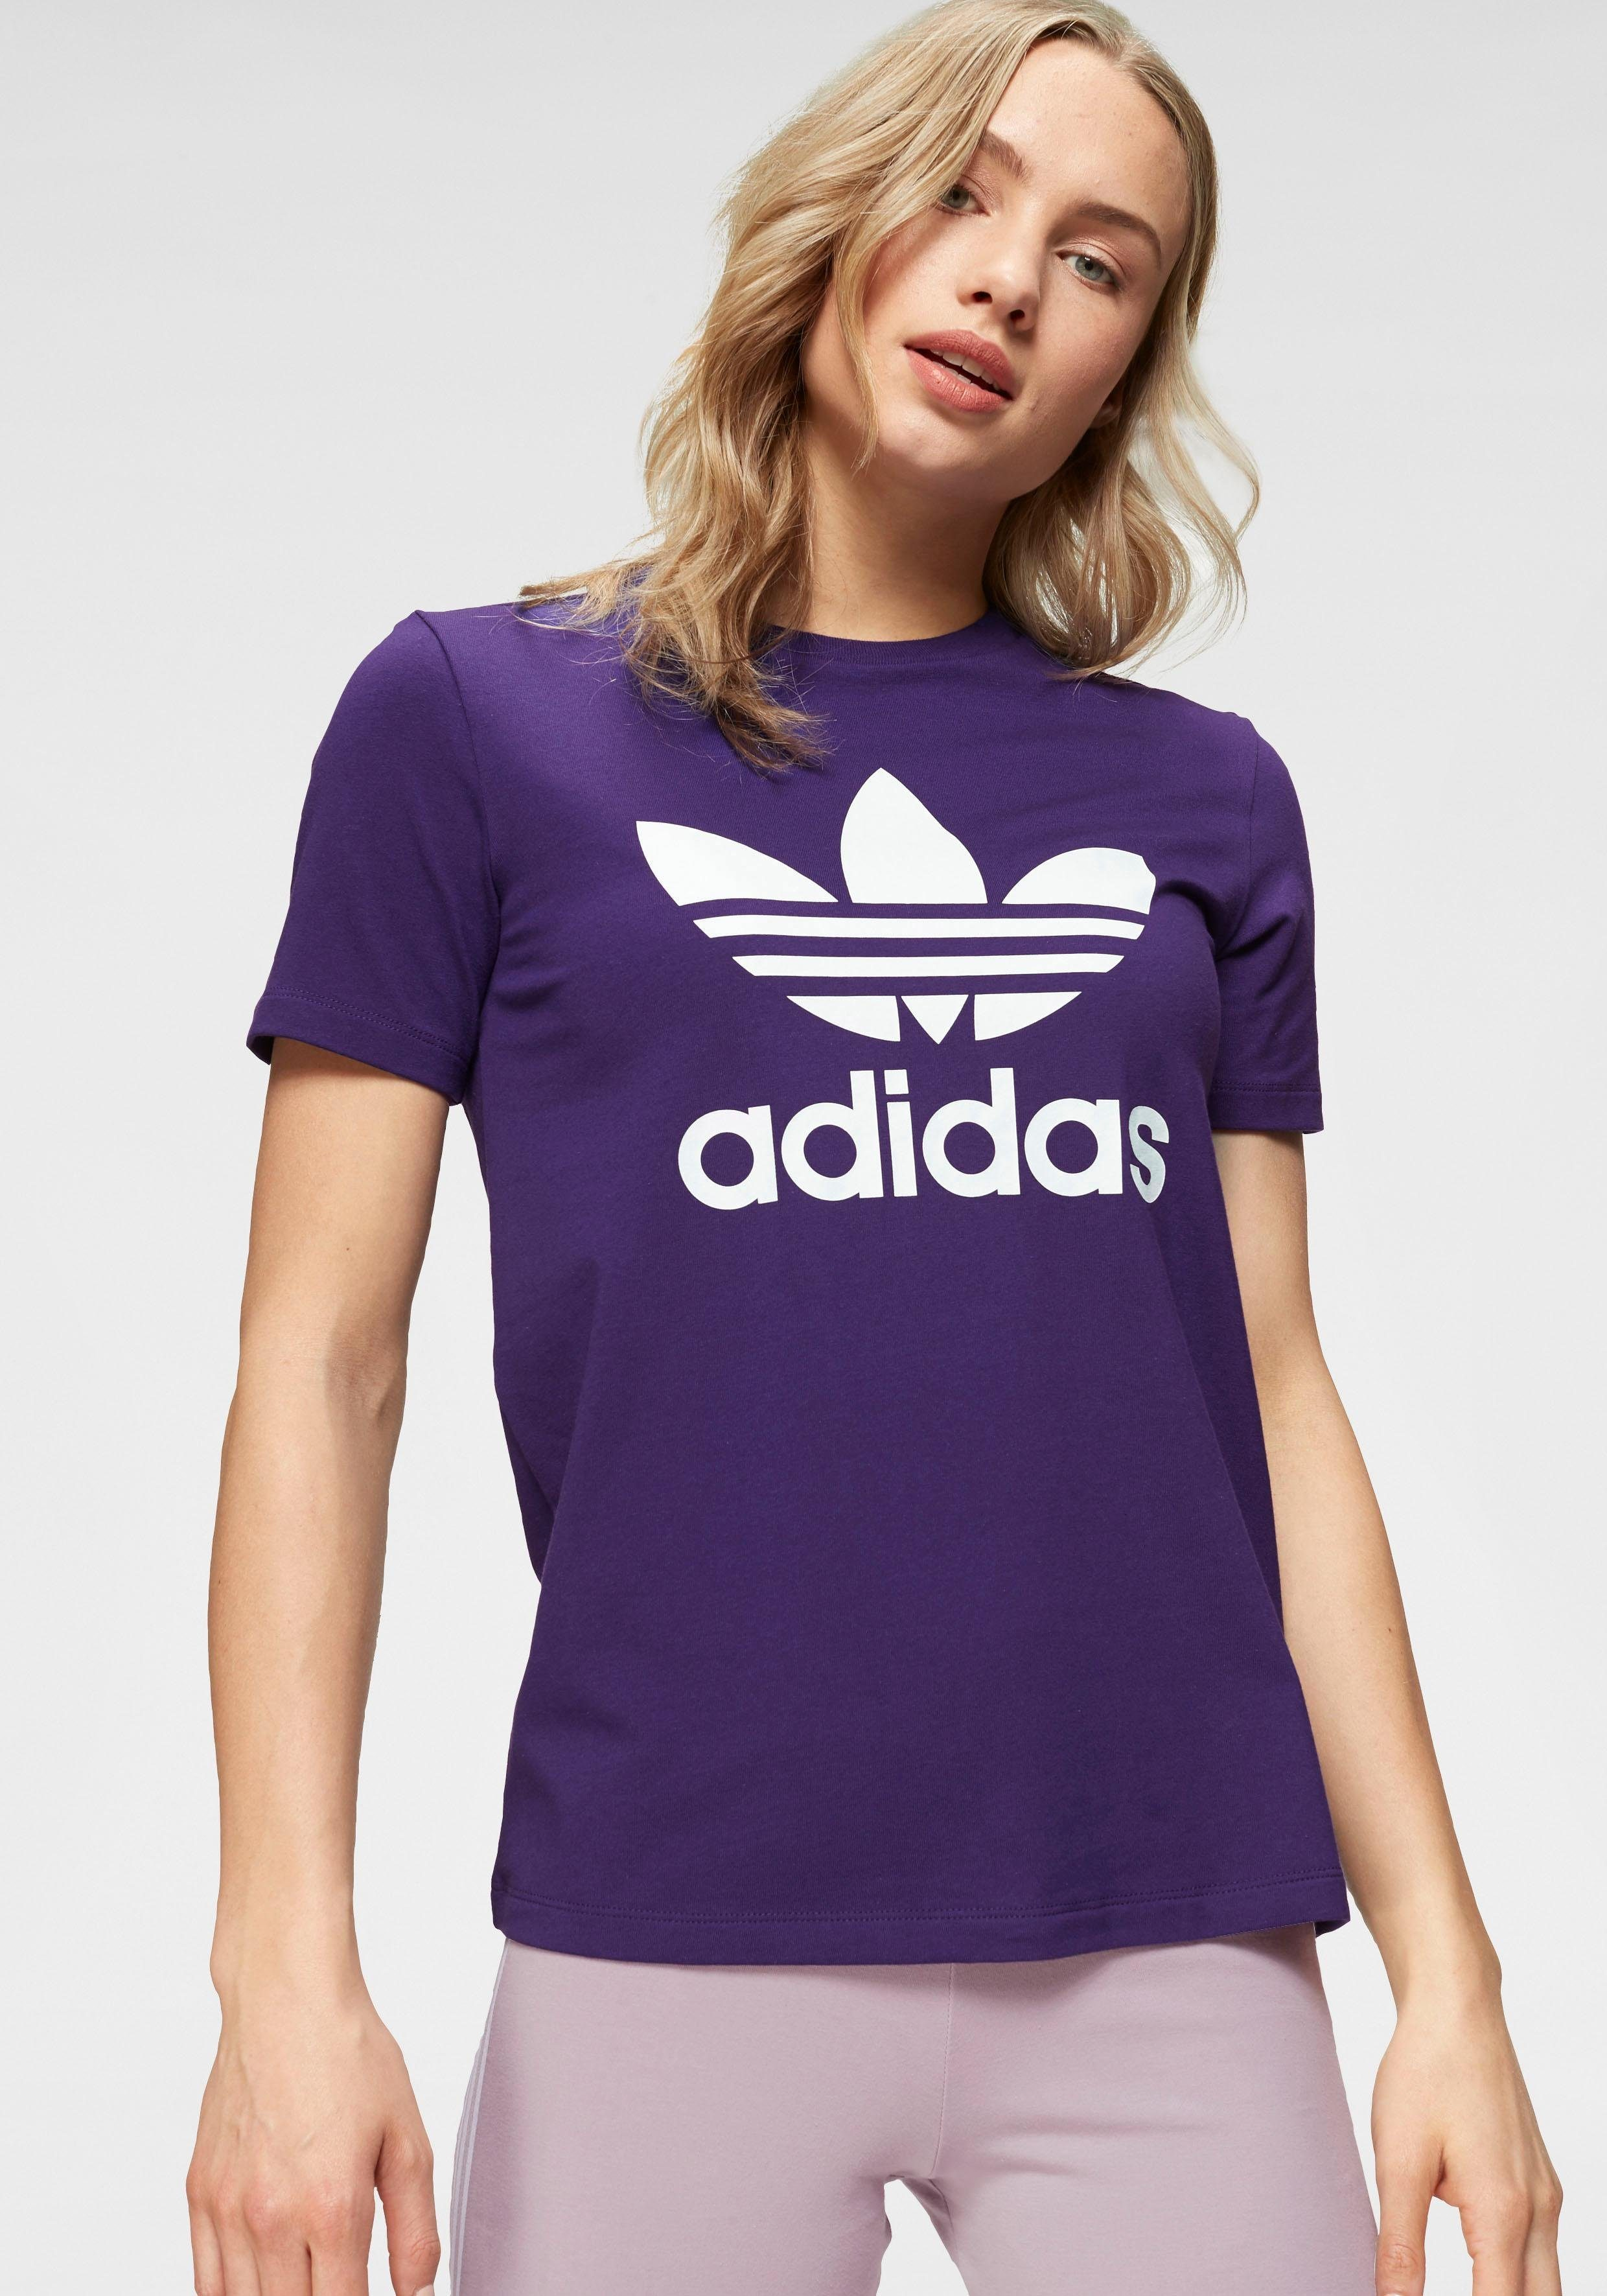 adidas originals 3 stripes tee t shirt bunt